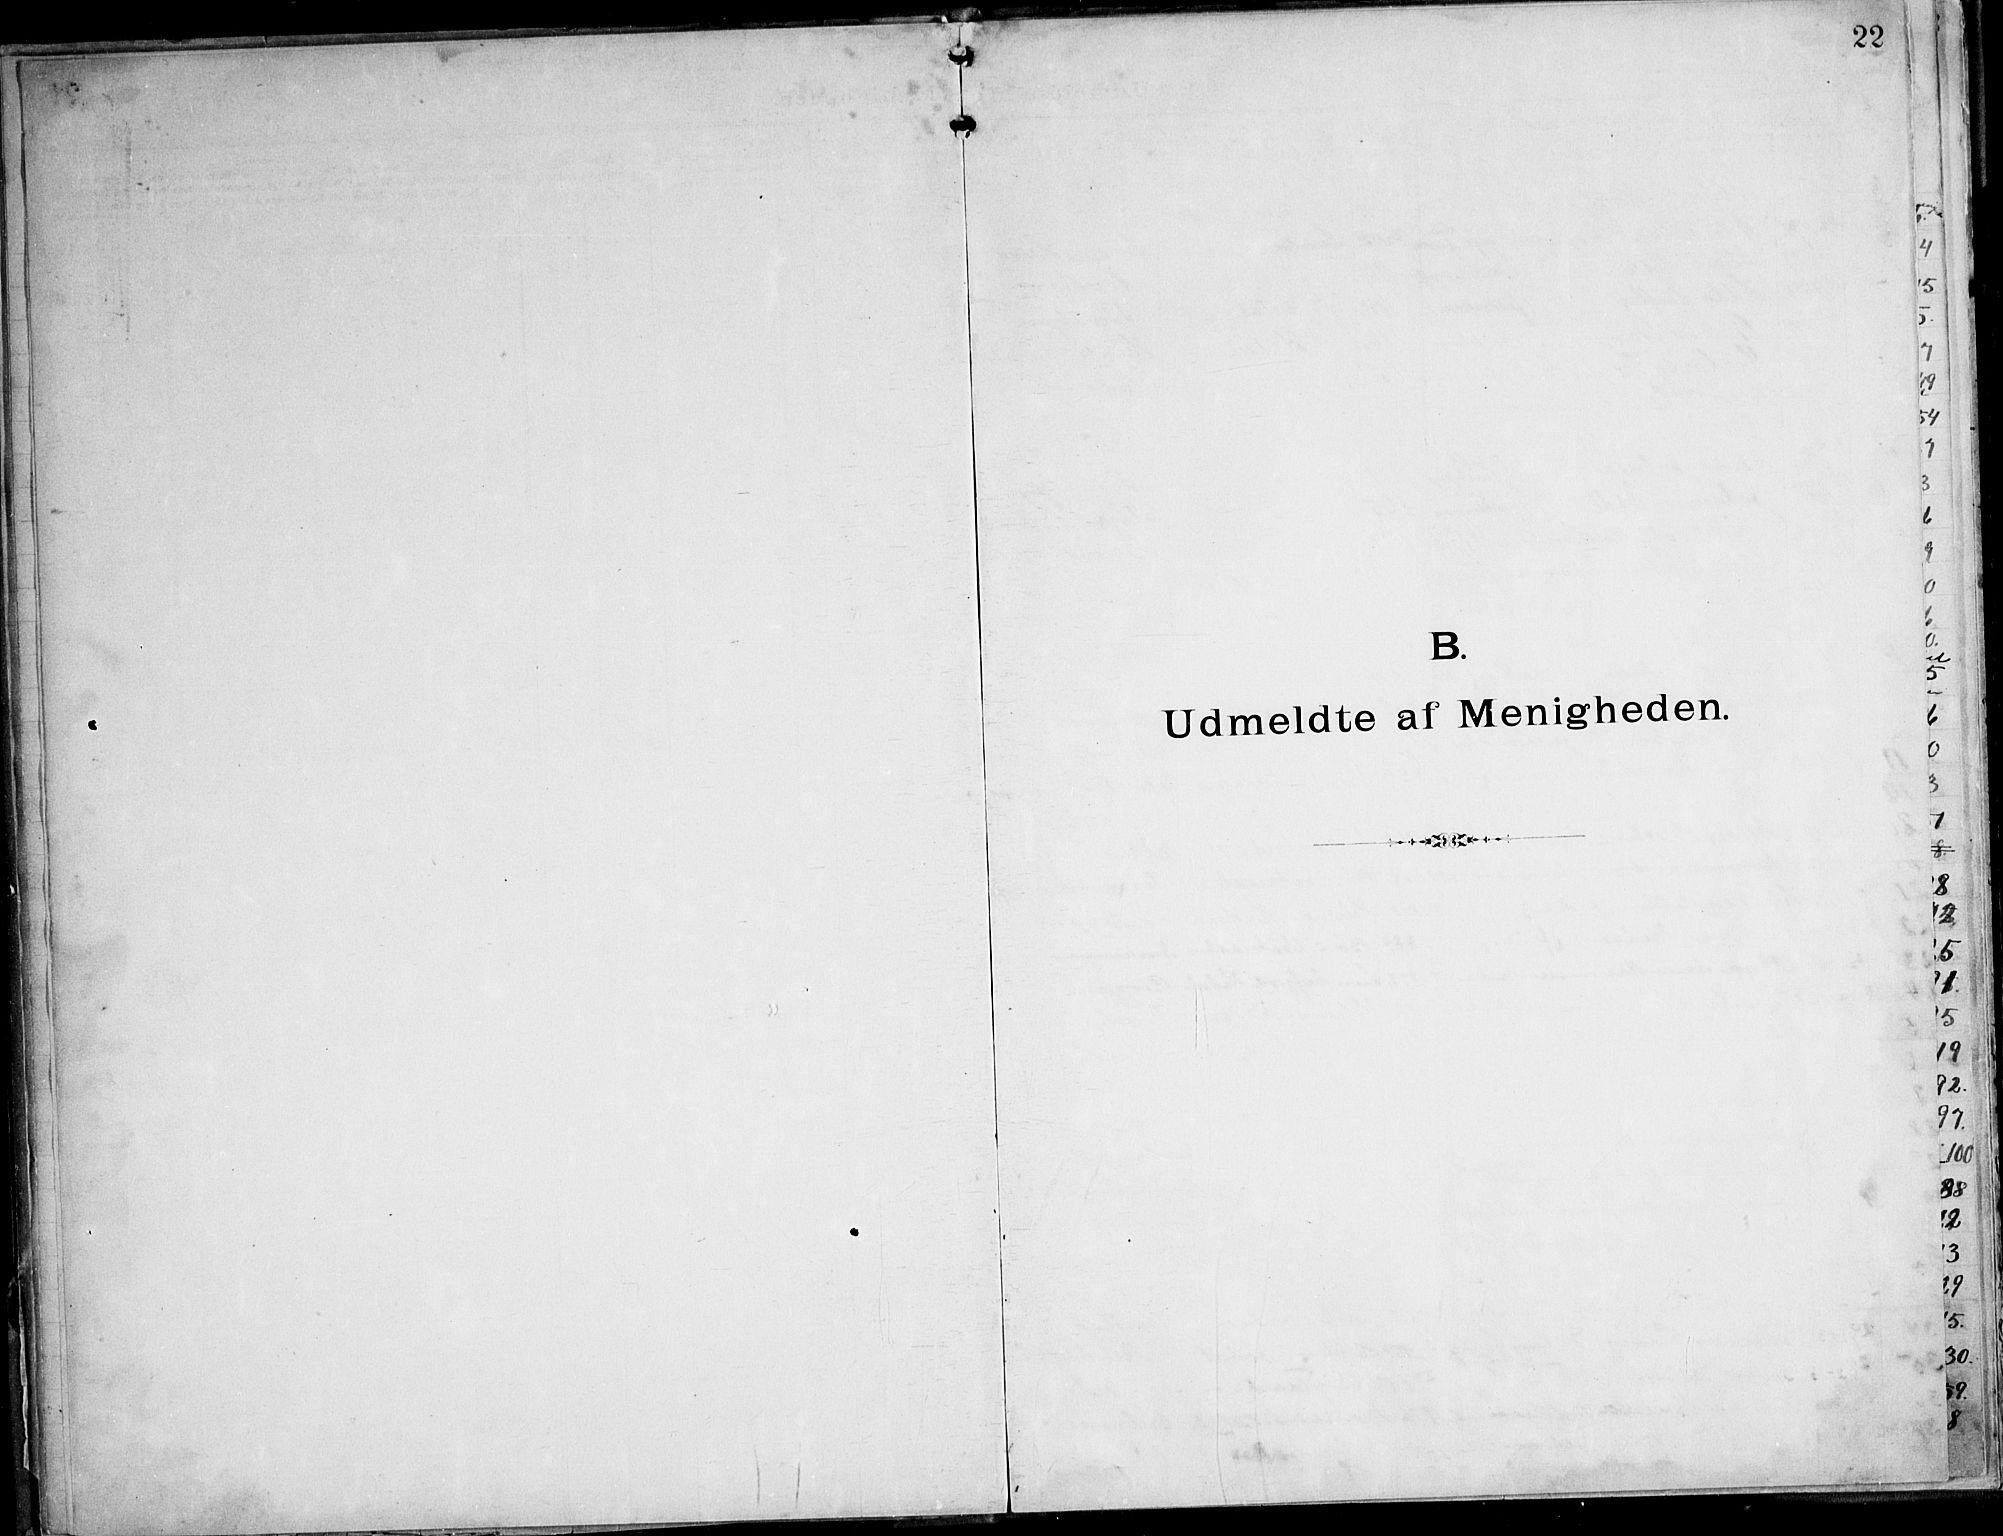 SAT, Ministerialprotokoller, klokkerbøker og fødselsregistre - Nordland, 888/L1276: Dissenter register no. 888D03, 1893-1944, p. 22